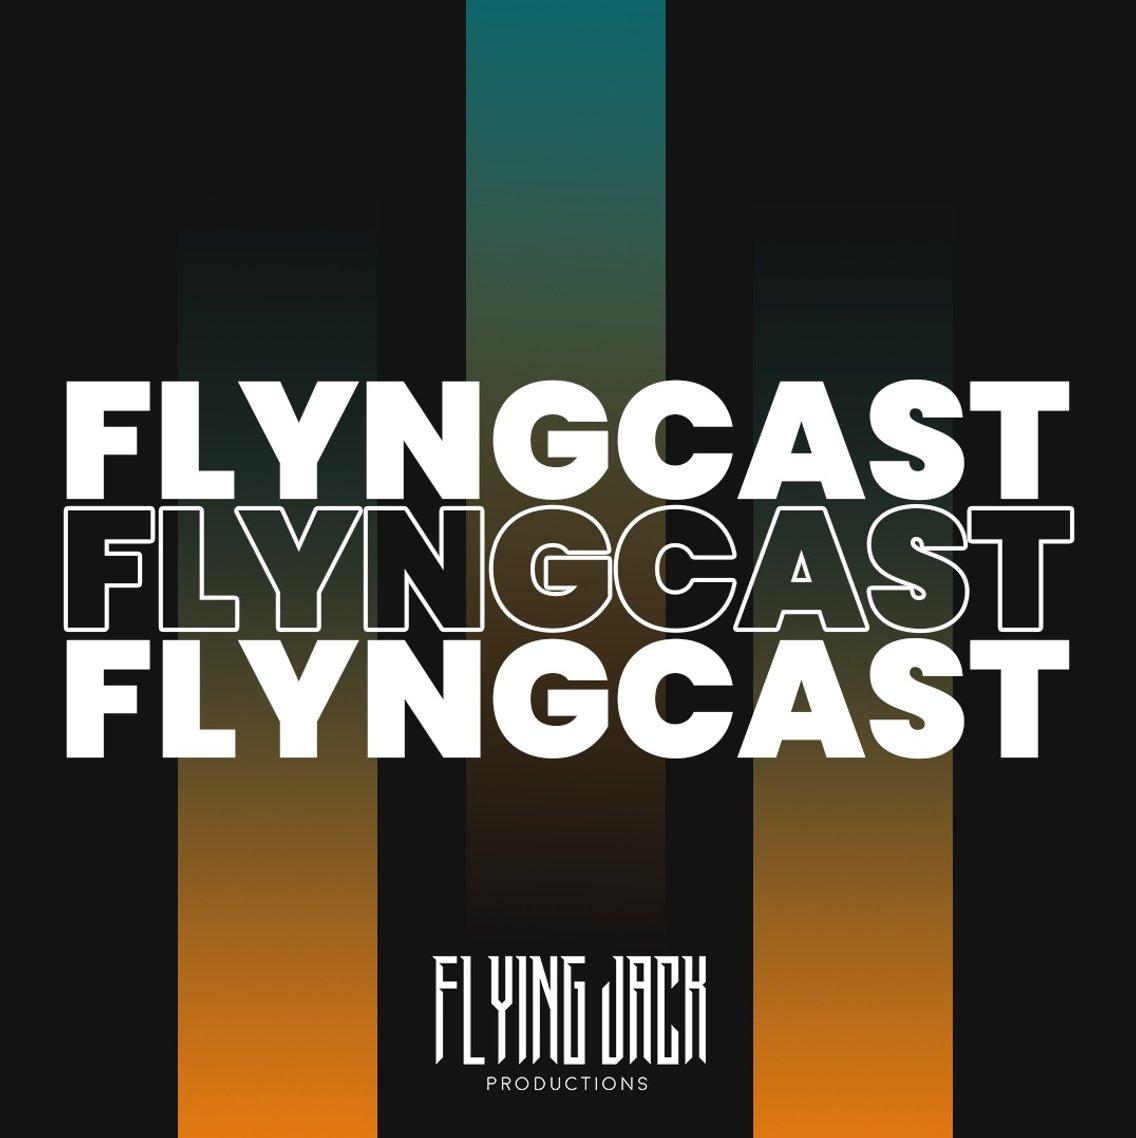 FlyingCast - imagen de portada